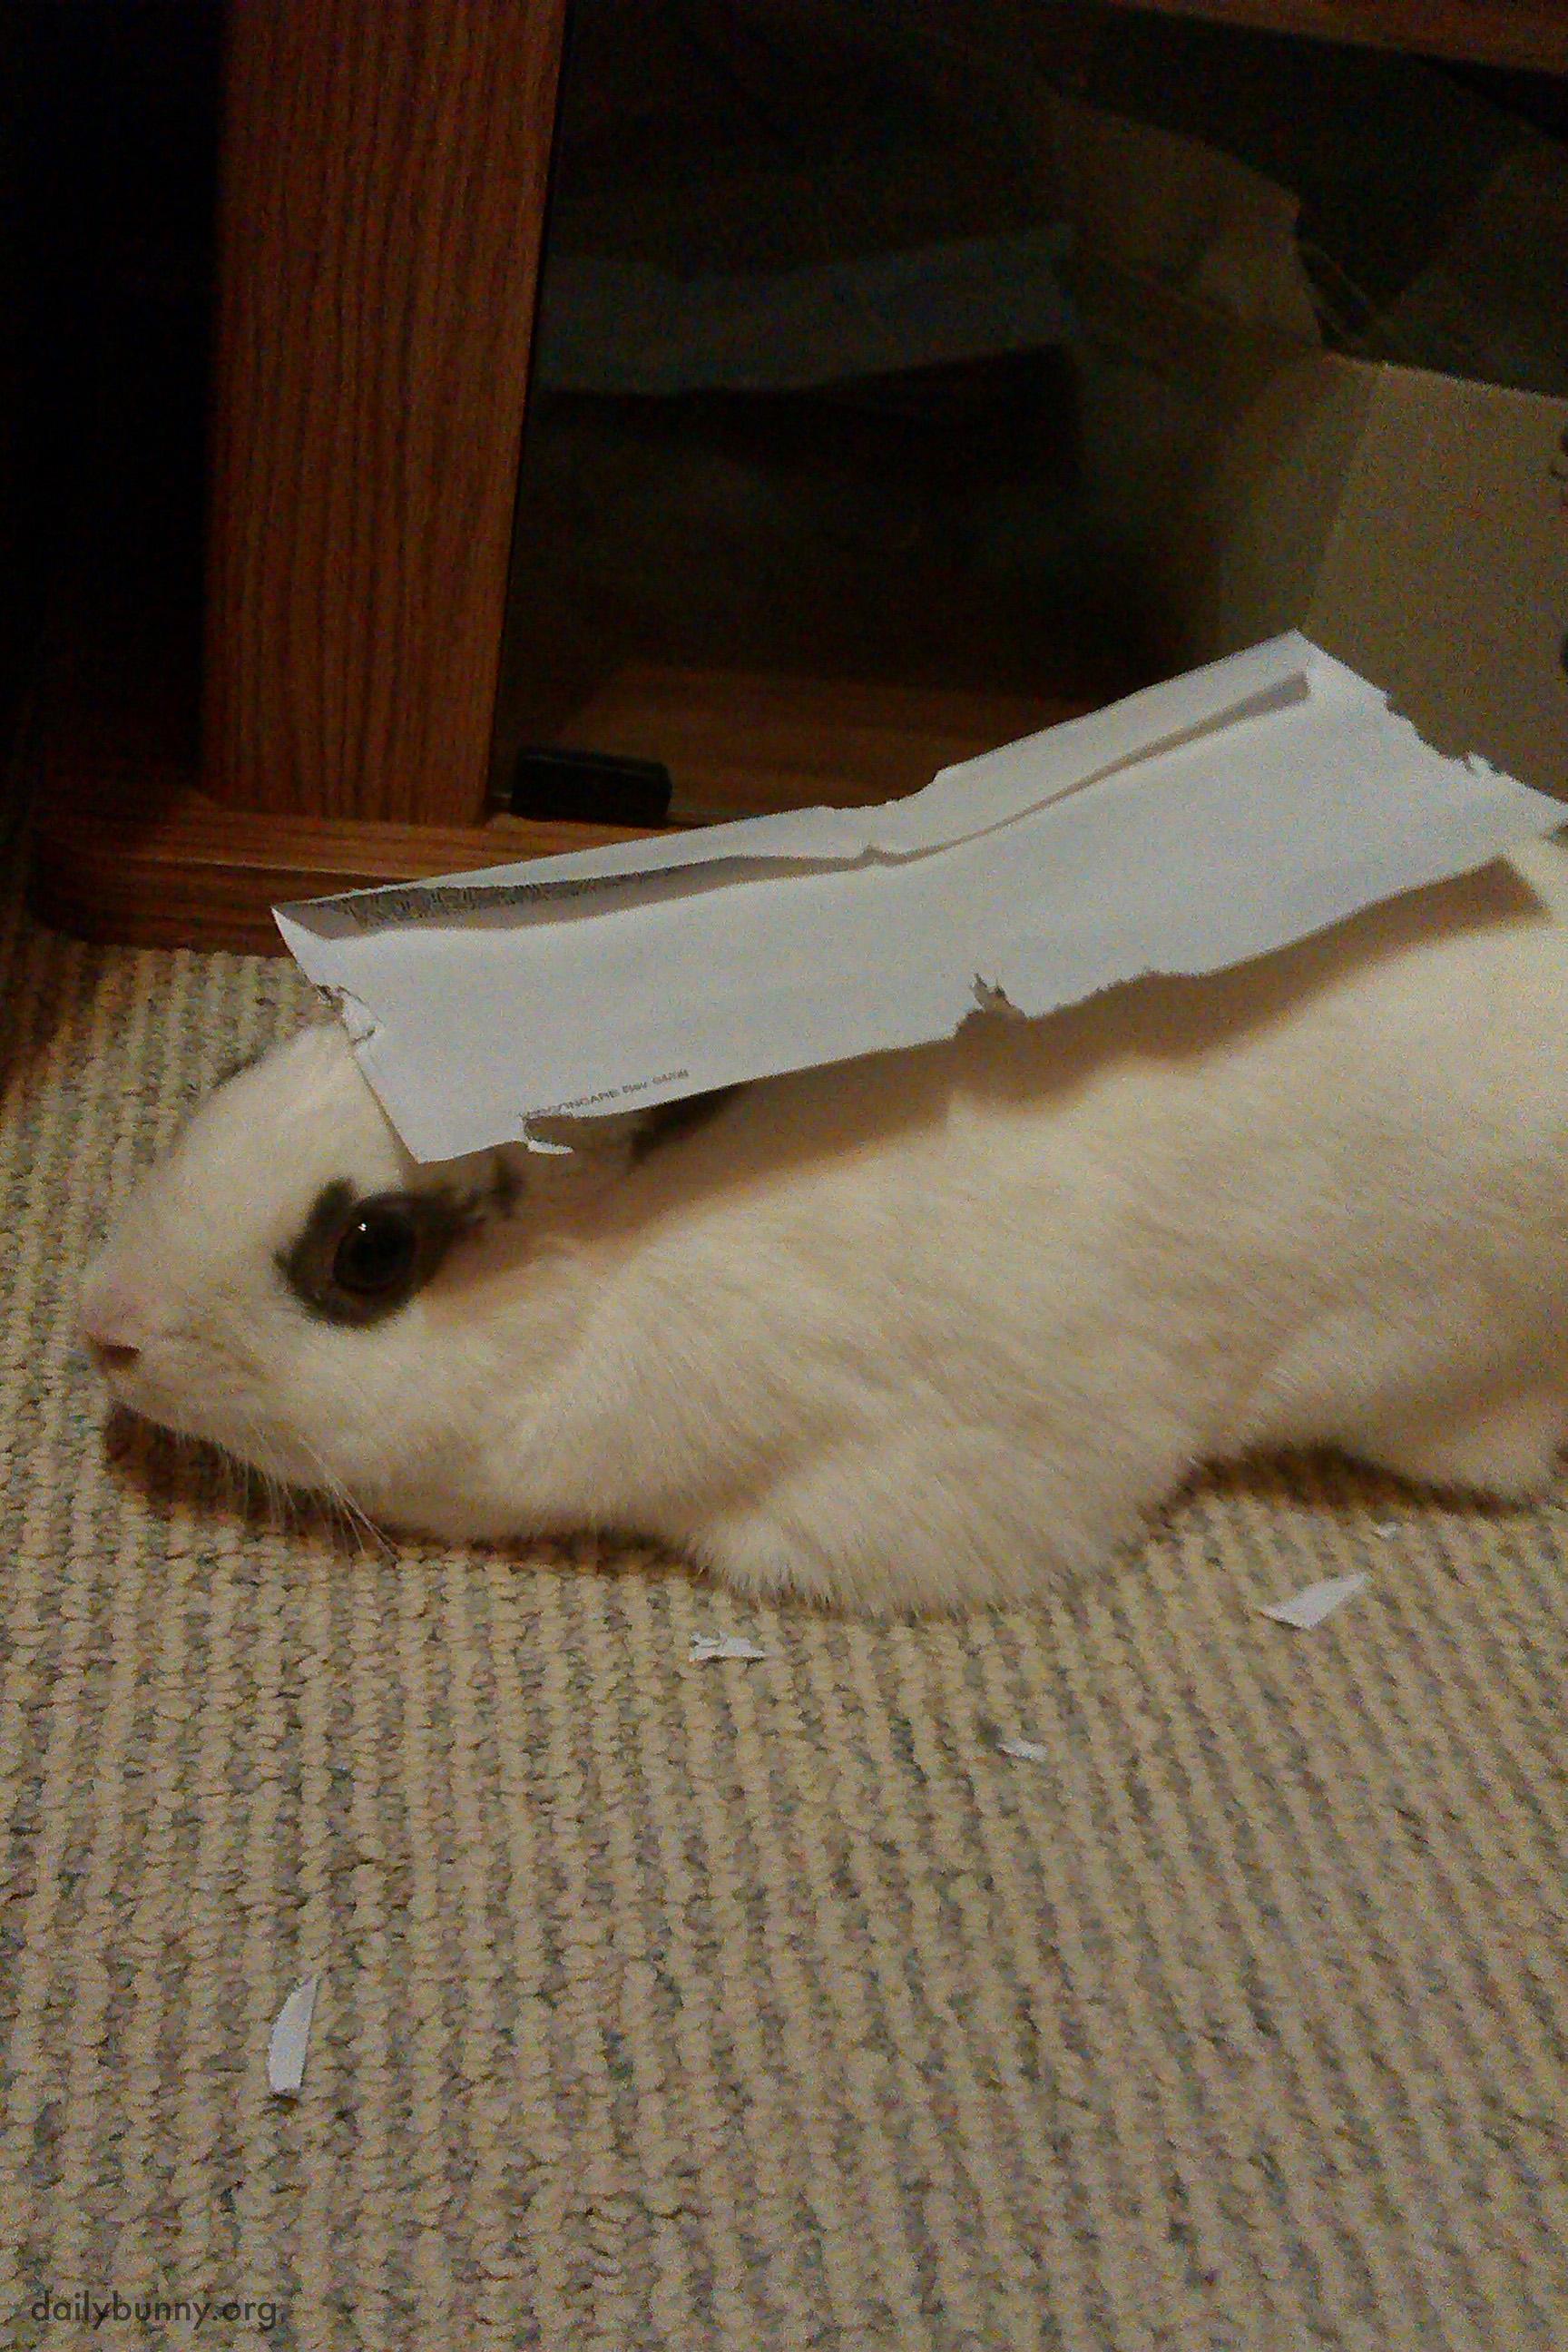 Bunny vs. Envelope, Envelope Prevails